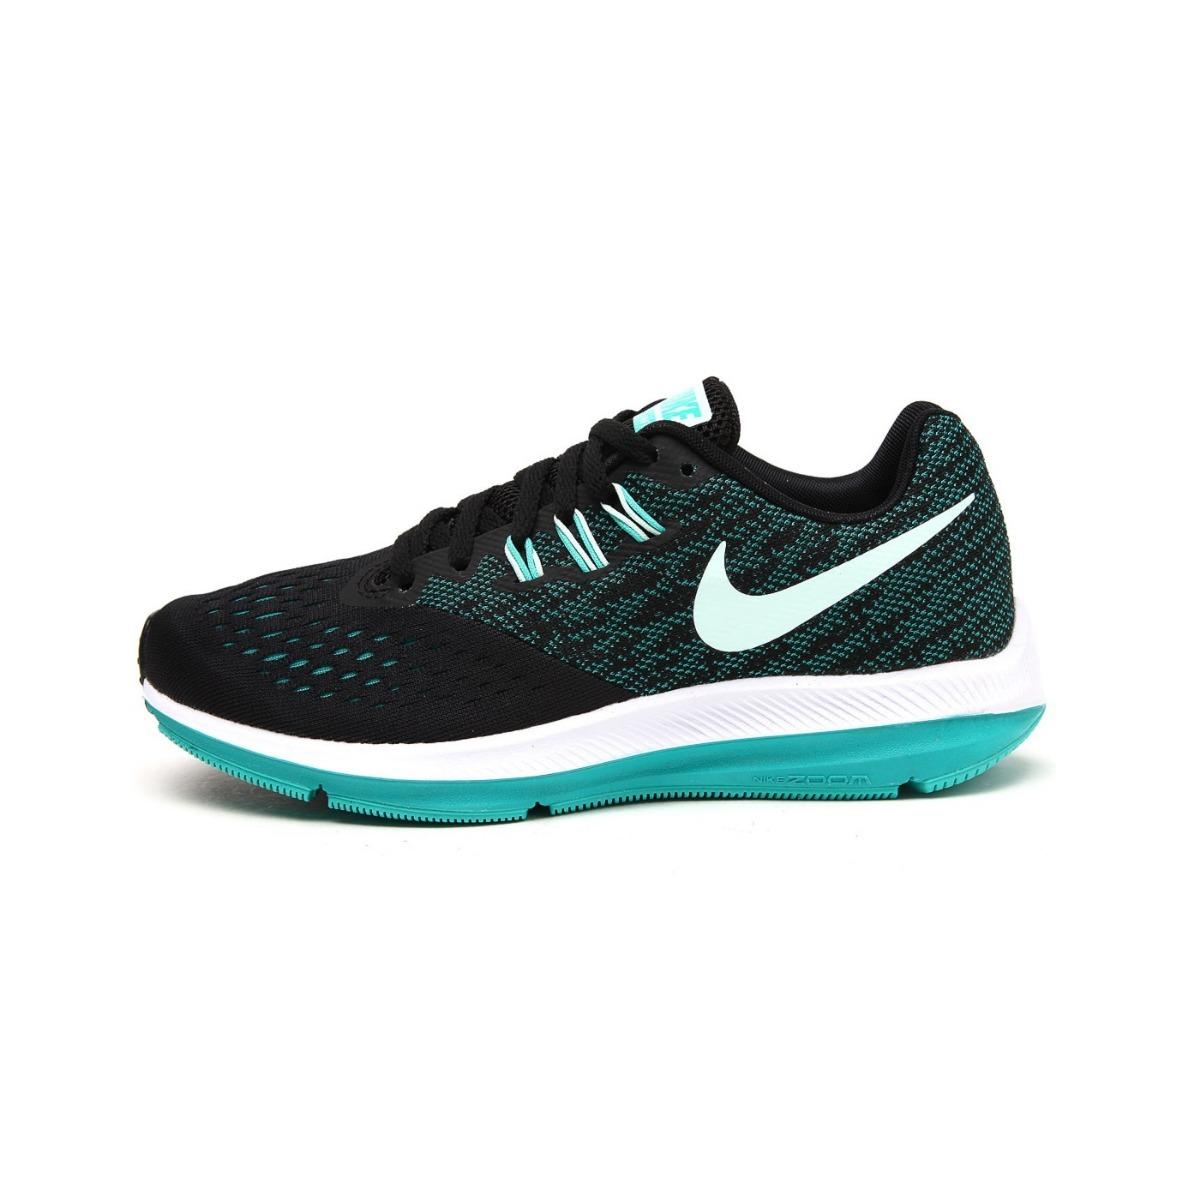 ccaf8904524 Tênis Nike Zoom Winflo 4 898485 Running Feminino Original - R  399 ...